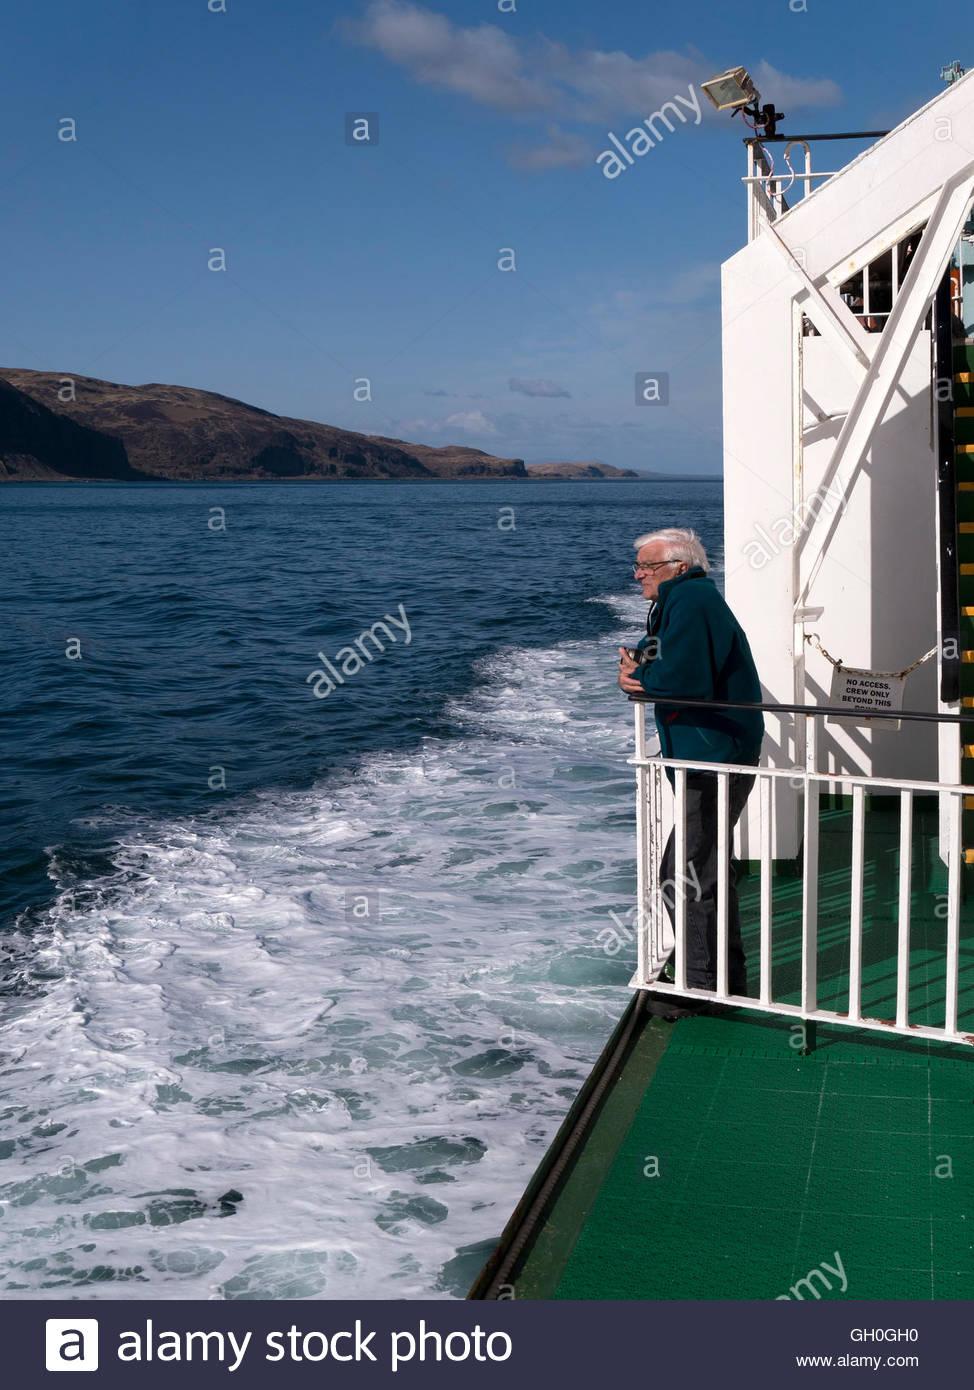 Passenger admires view from Caledonian Macbrayne ferry (Clansman) in Sound of Kerrera, Oban, Scotland, UK. - Stock Image